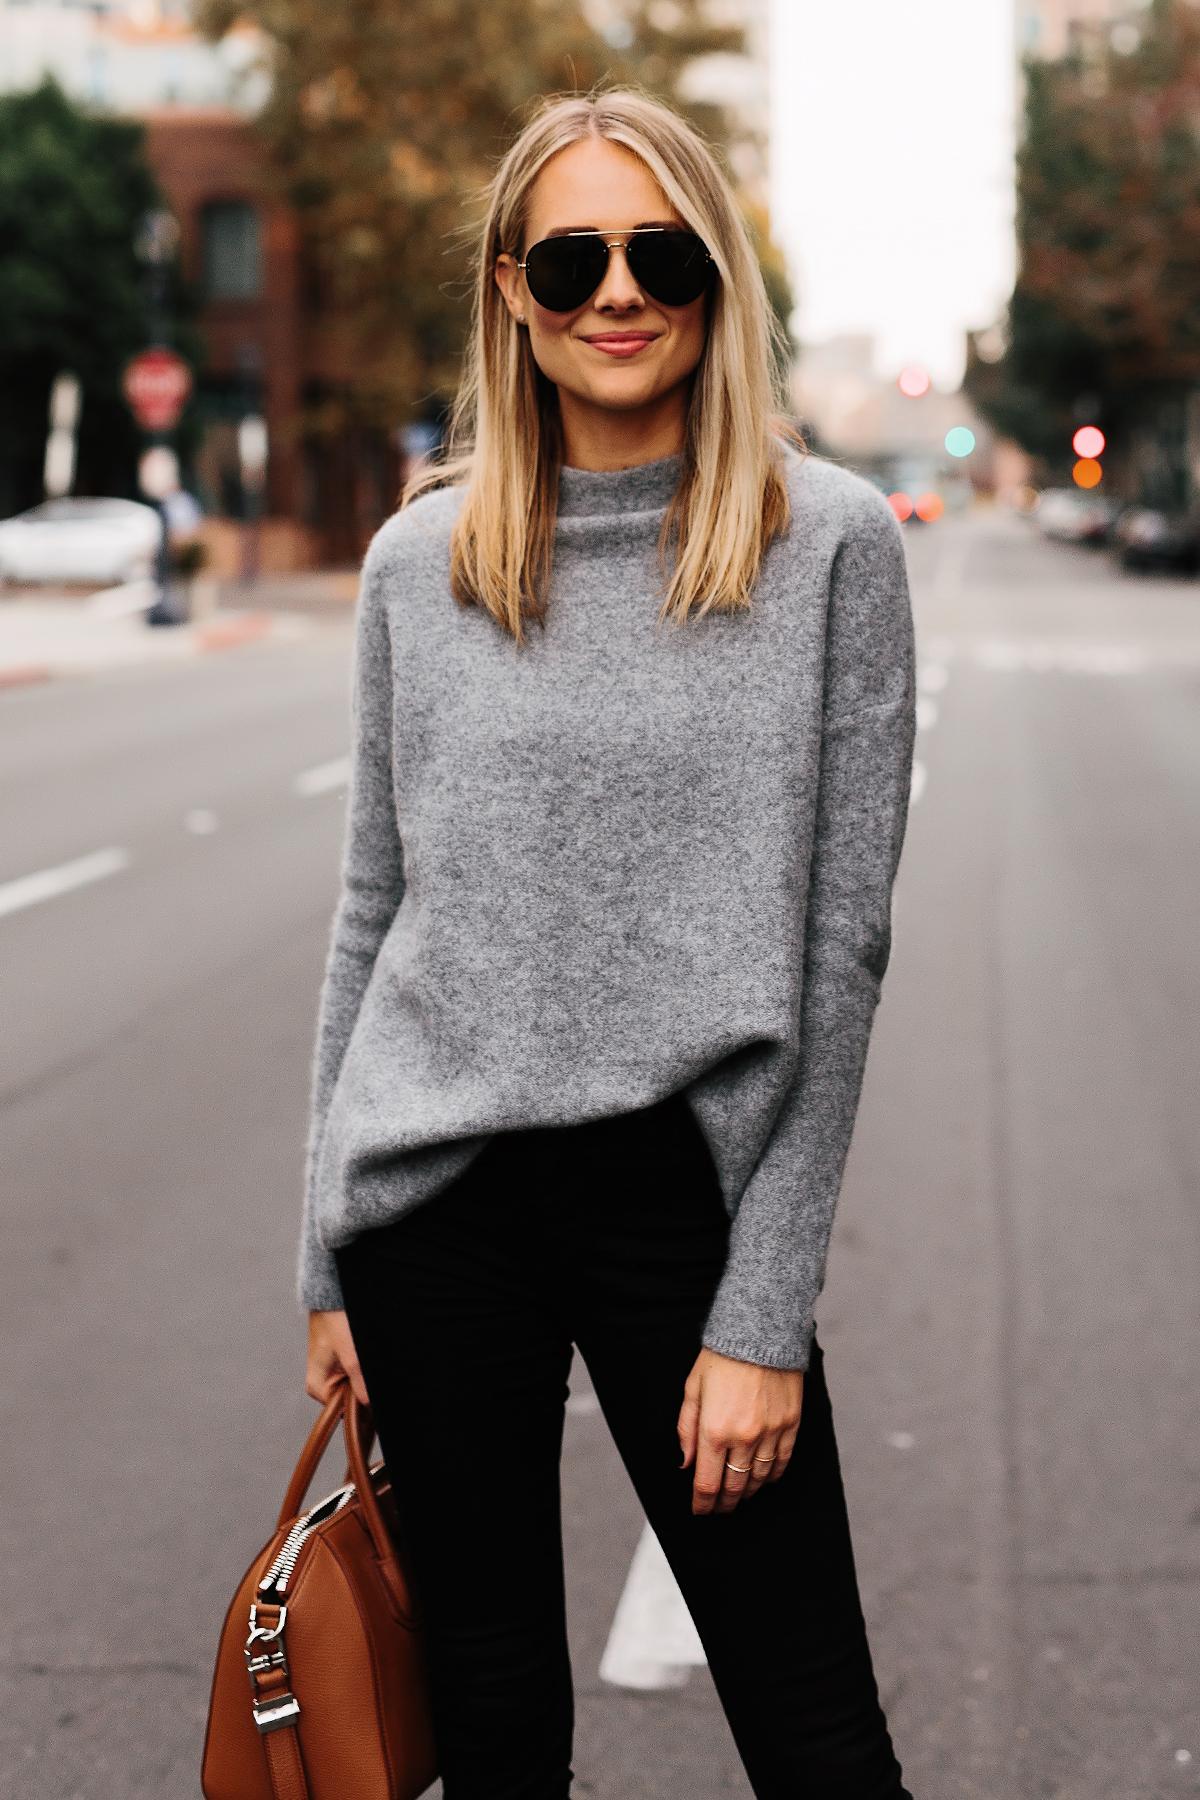 Fashion Jackson Bloomingdales Grey Cashmere Mock Neck Sweater Black Skinny Jeans Tan Handbag Aviator Sunglasses